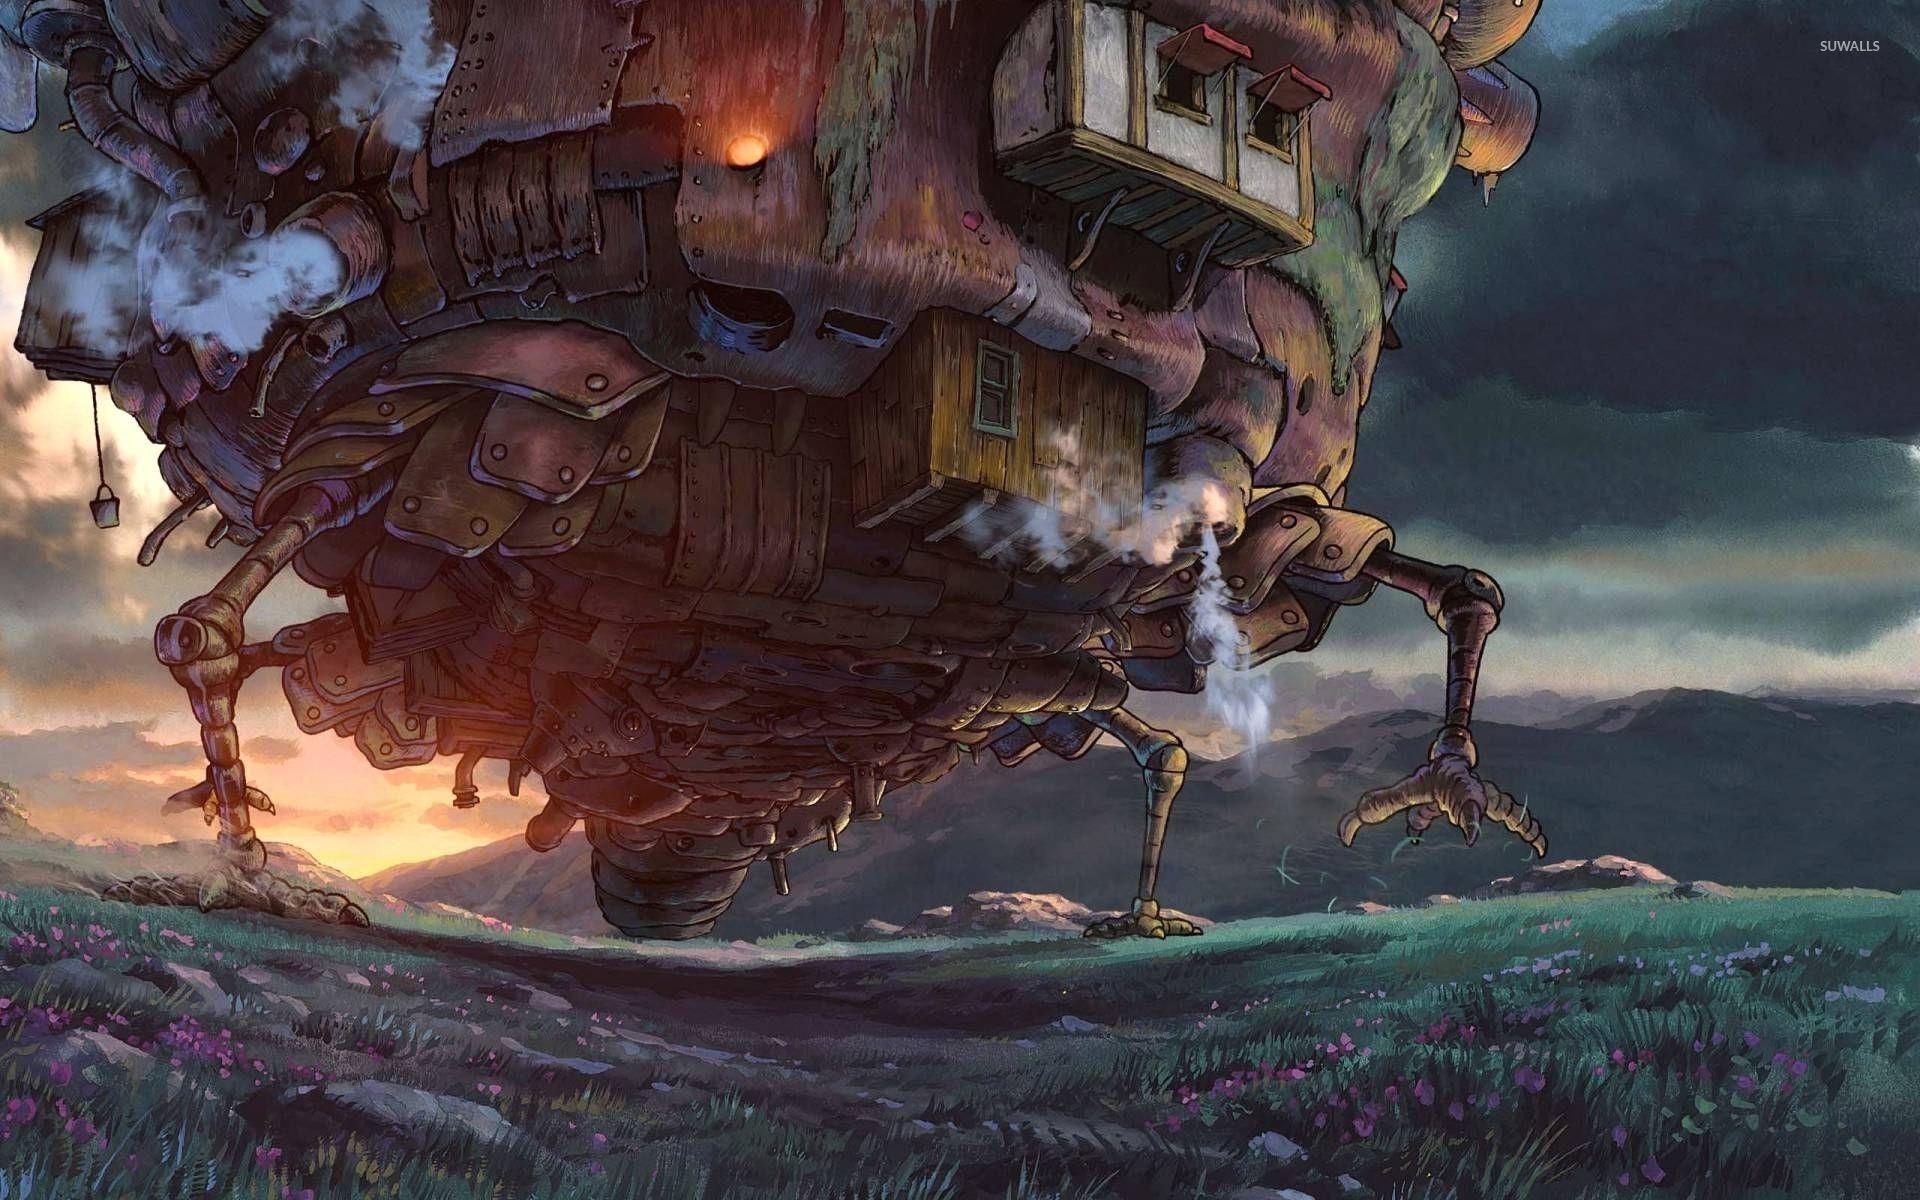 Suggestions Online Images Of Howls Moving Castle Wallpaper 1920x1080 Miyasaki Pelis Peliculas